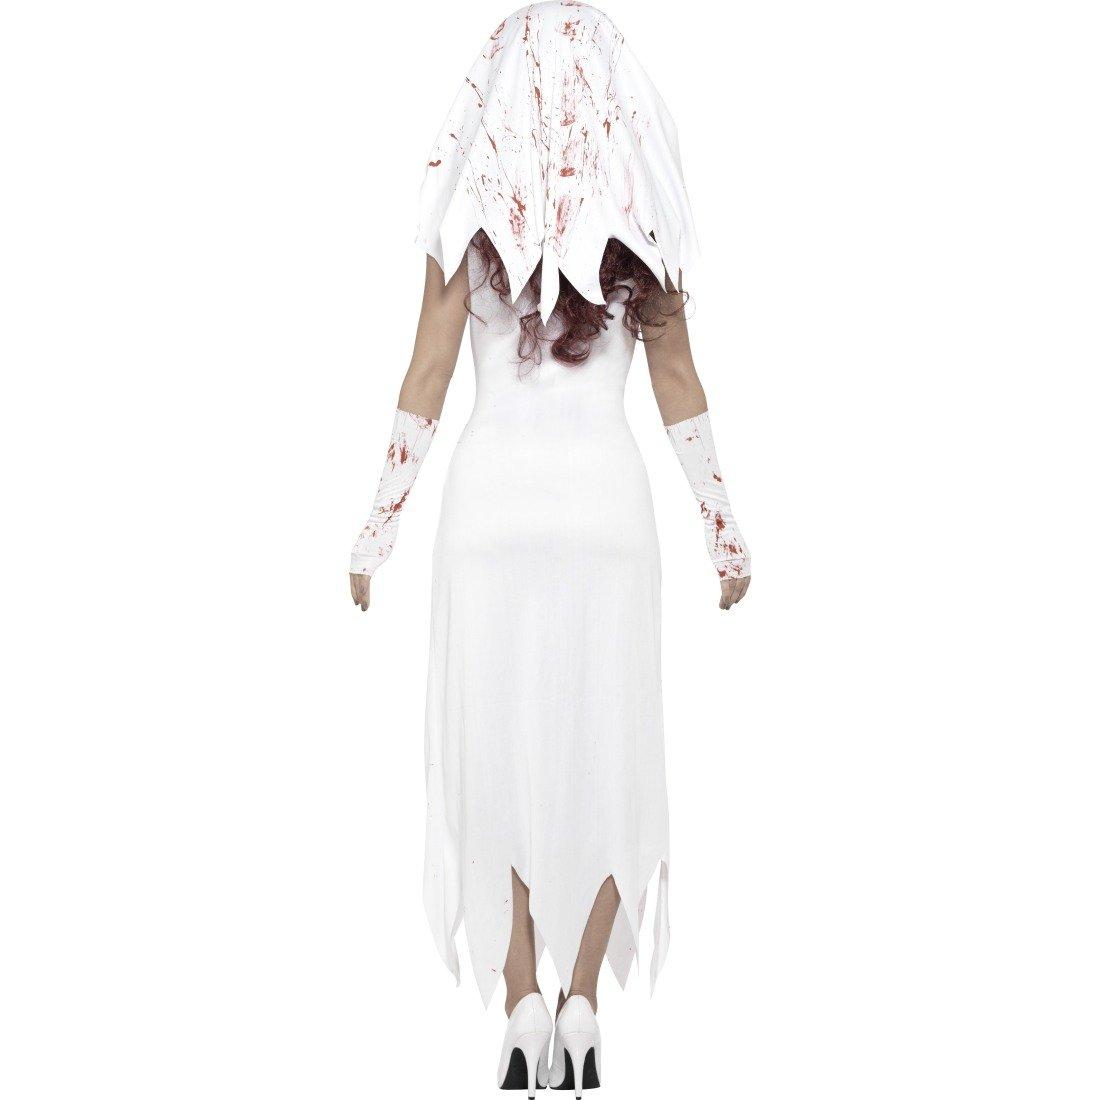 Halloweenkostüm Geisterbraut Zombie Damenkostüm Horror M 38-40